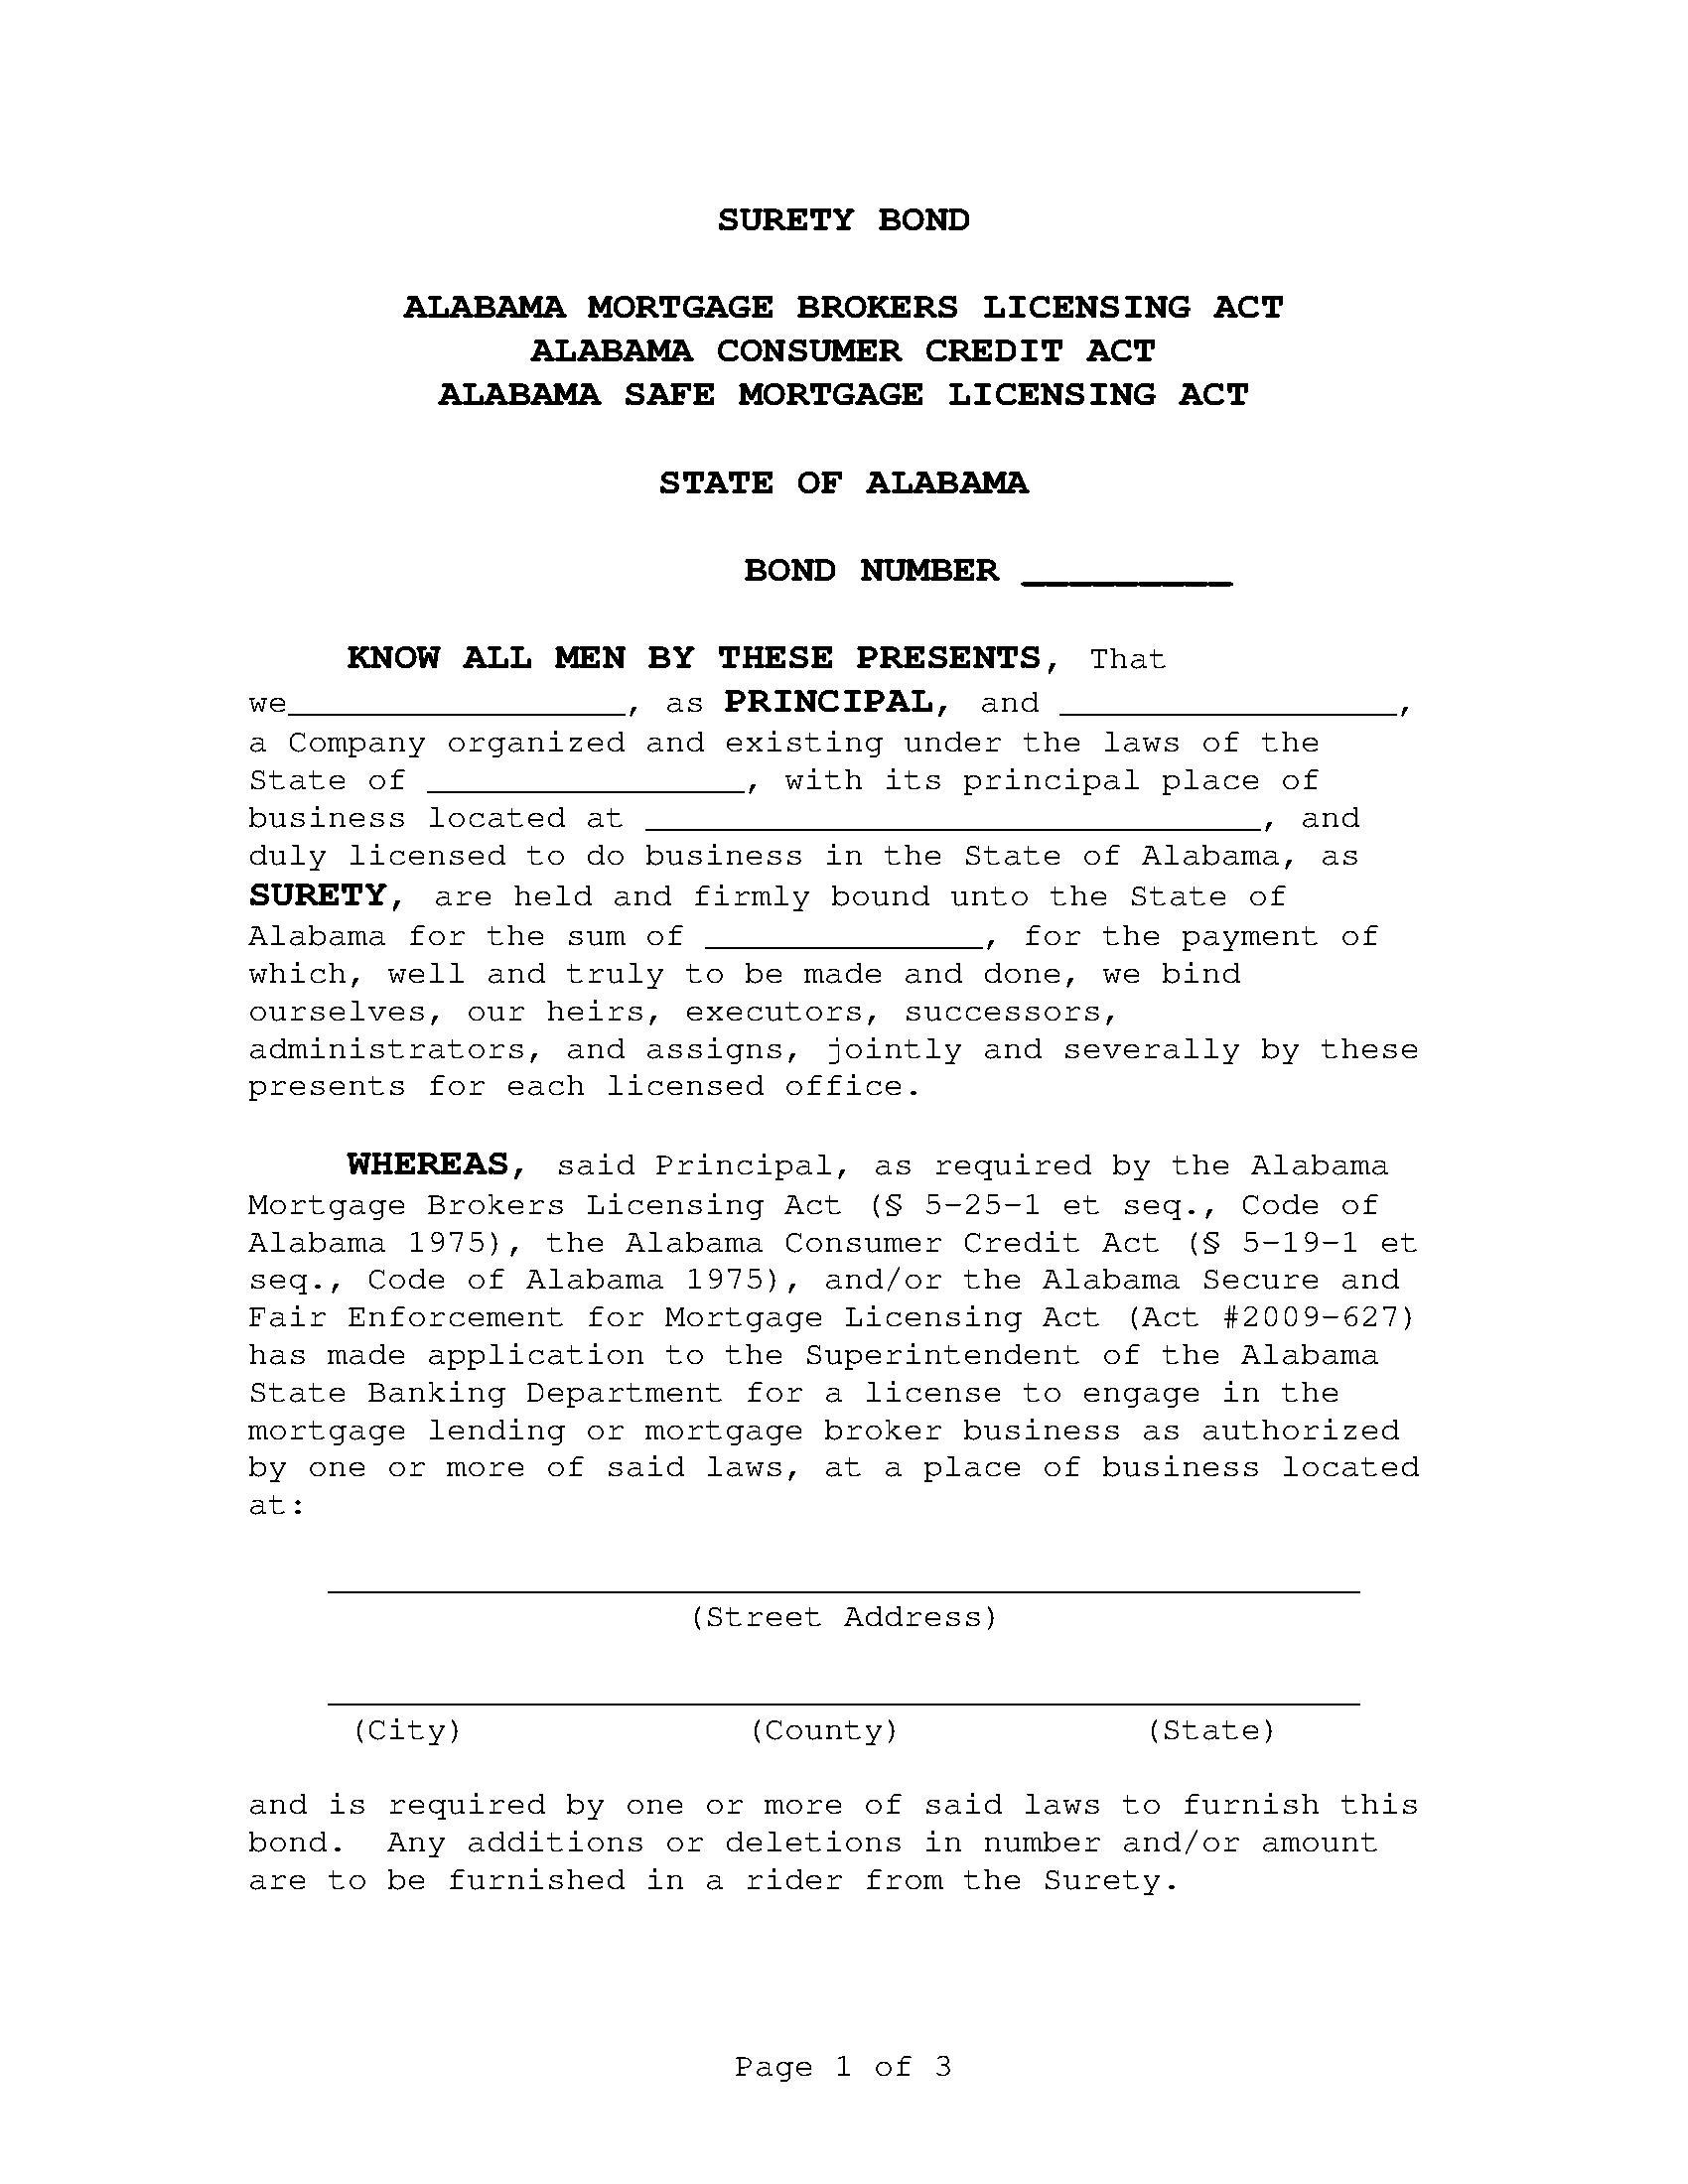 State of Alabama Mortgage Broker Bond sample image